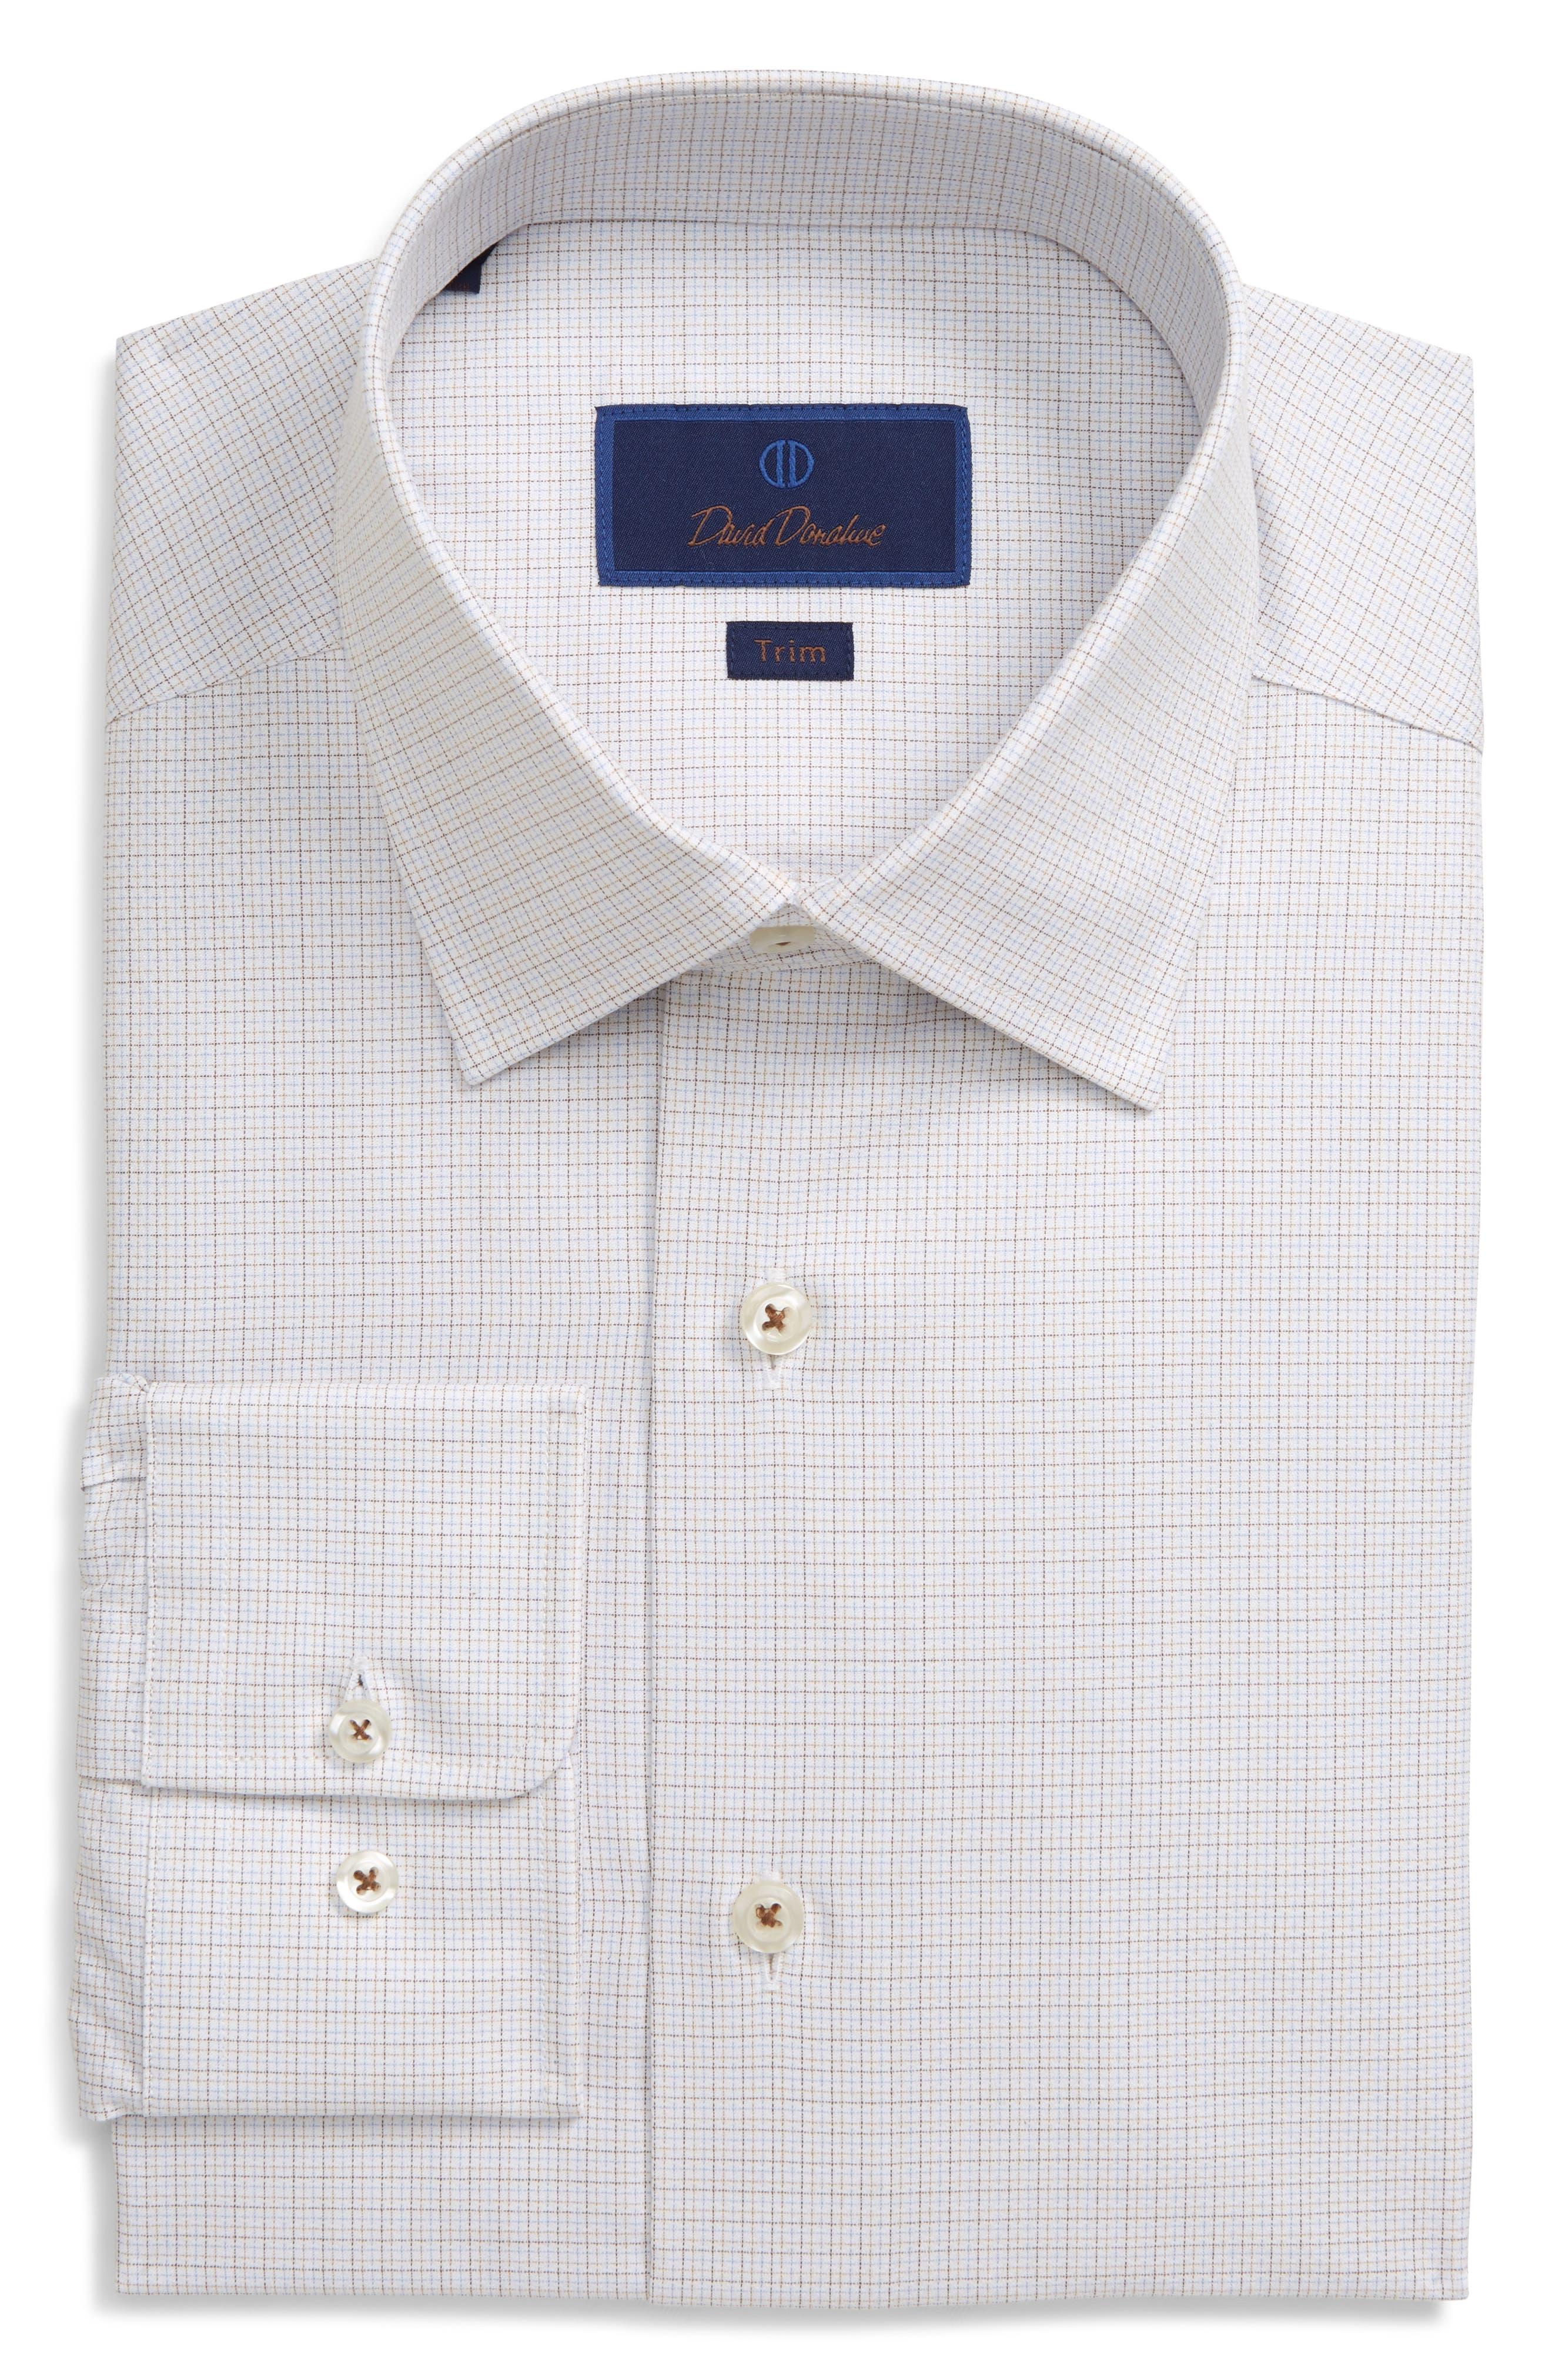 Image of David Donahue Trim Fit Plaid Dress Shirt